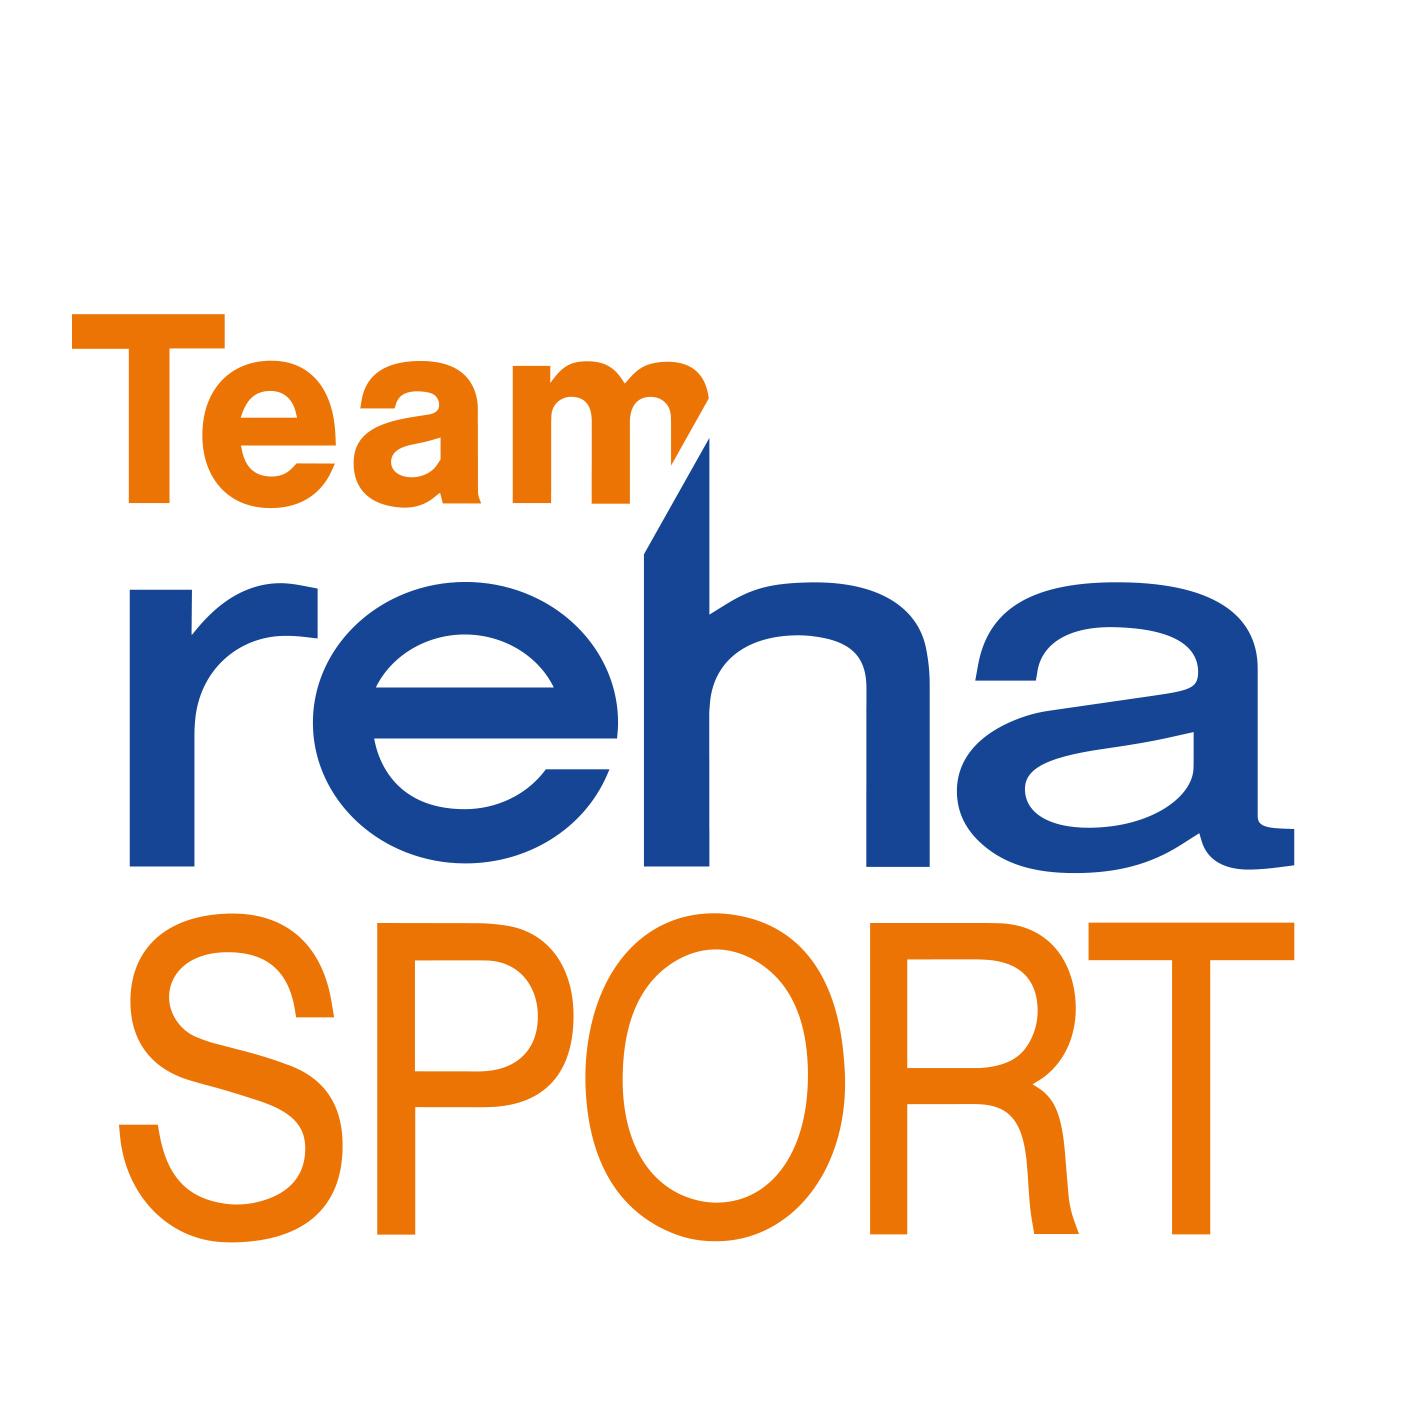 Team Rehasport